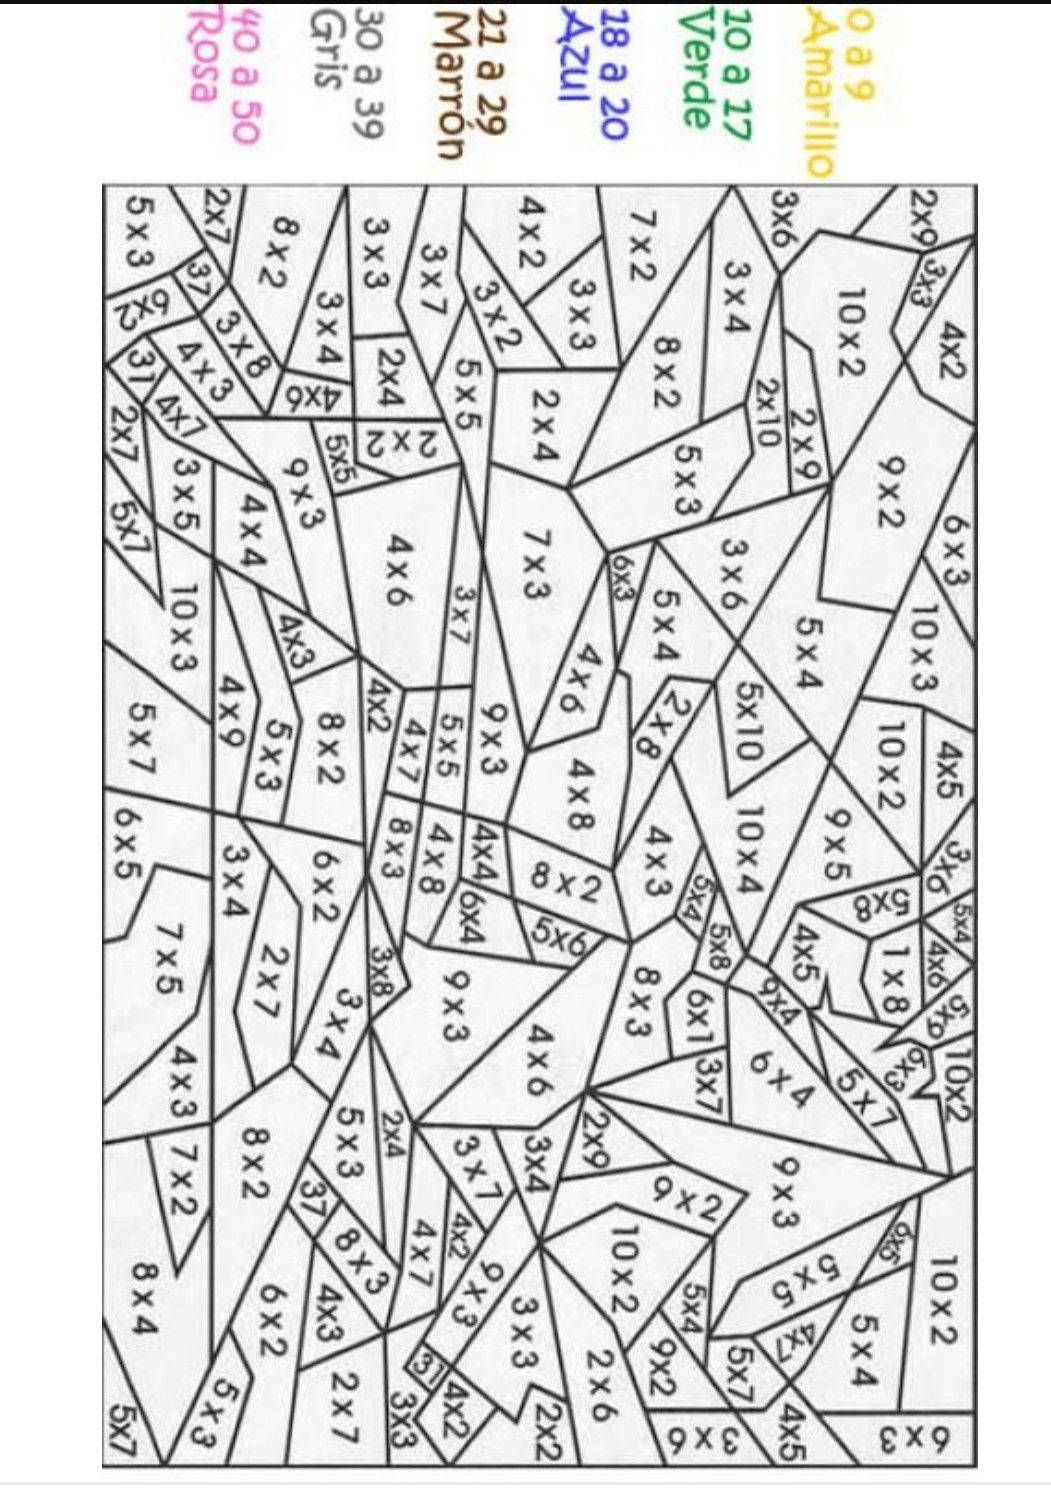 Pin By Amparo Polo On Dibujos Con Numeros Math Coloring Homeschool Math Elementary Math [ 1496 x 1051 Pixel ]